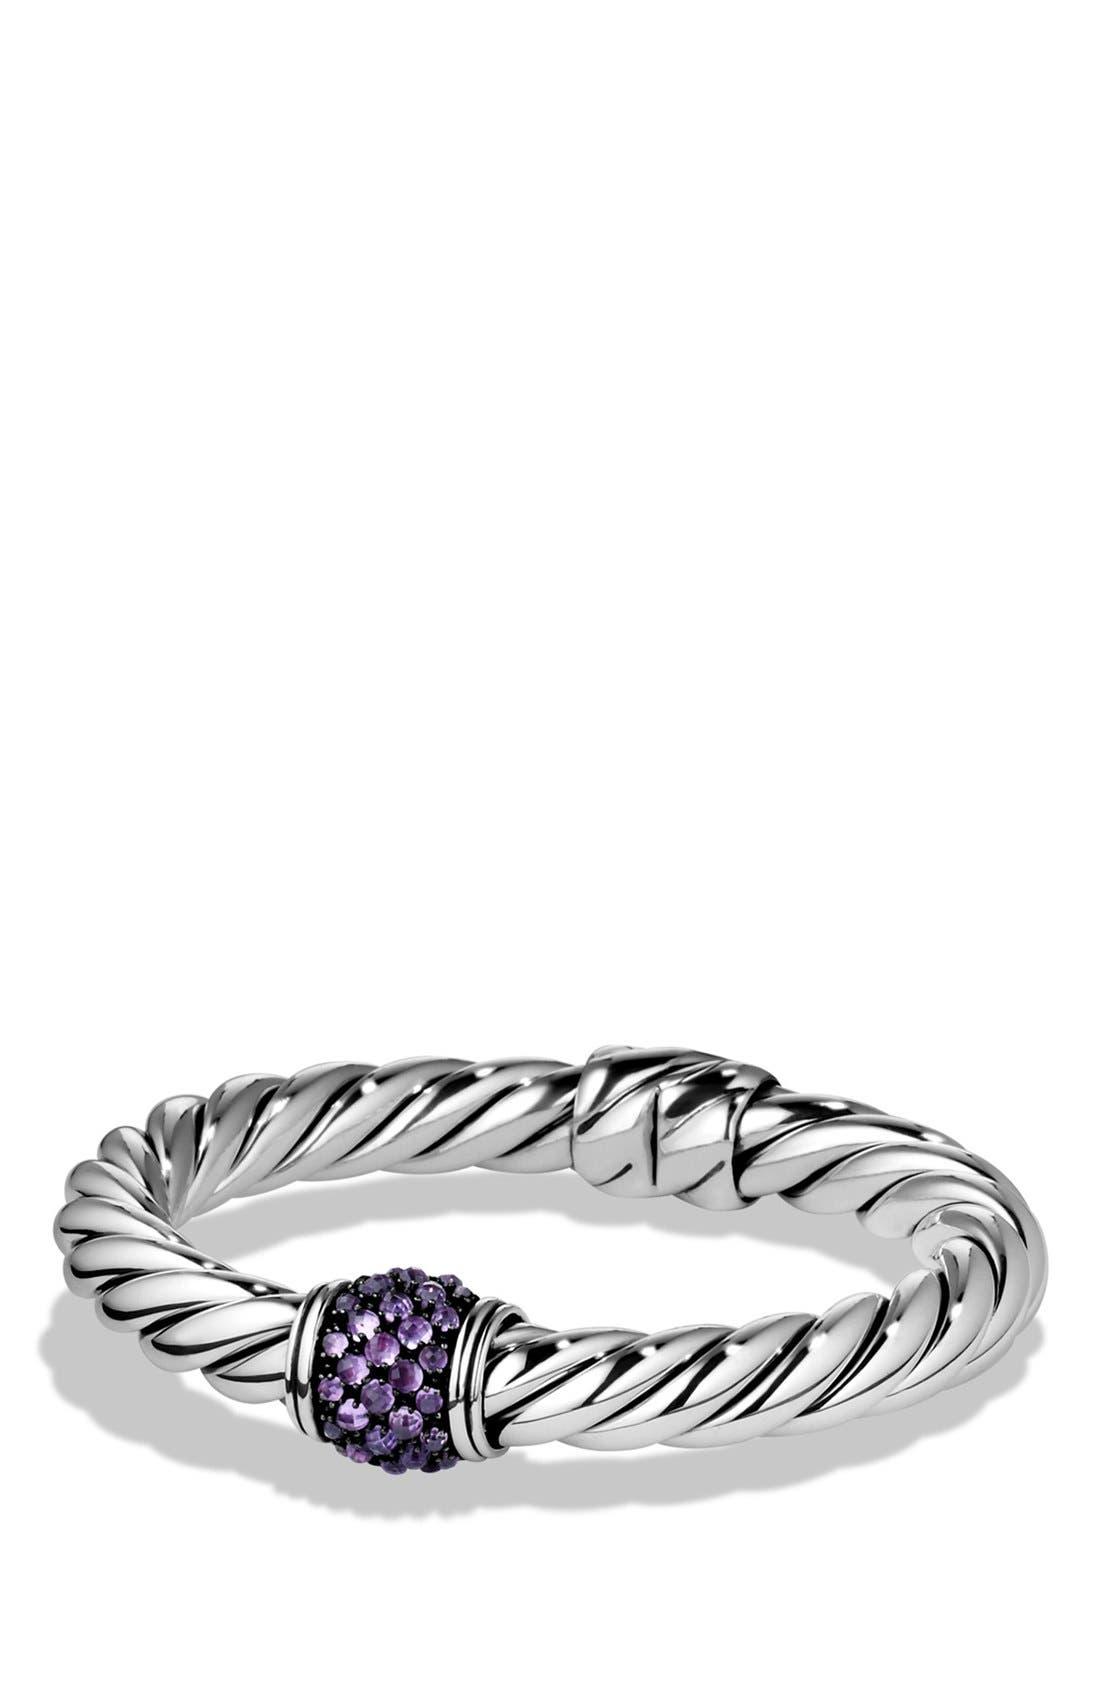 Alternate Image 1 Selected - David Yurman 'Osetra' Bracelet with Semiprecious Stone